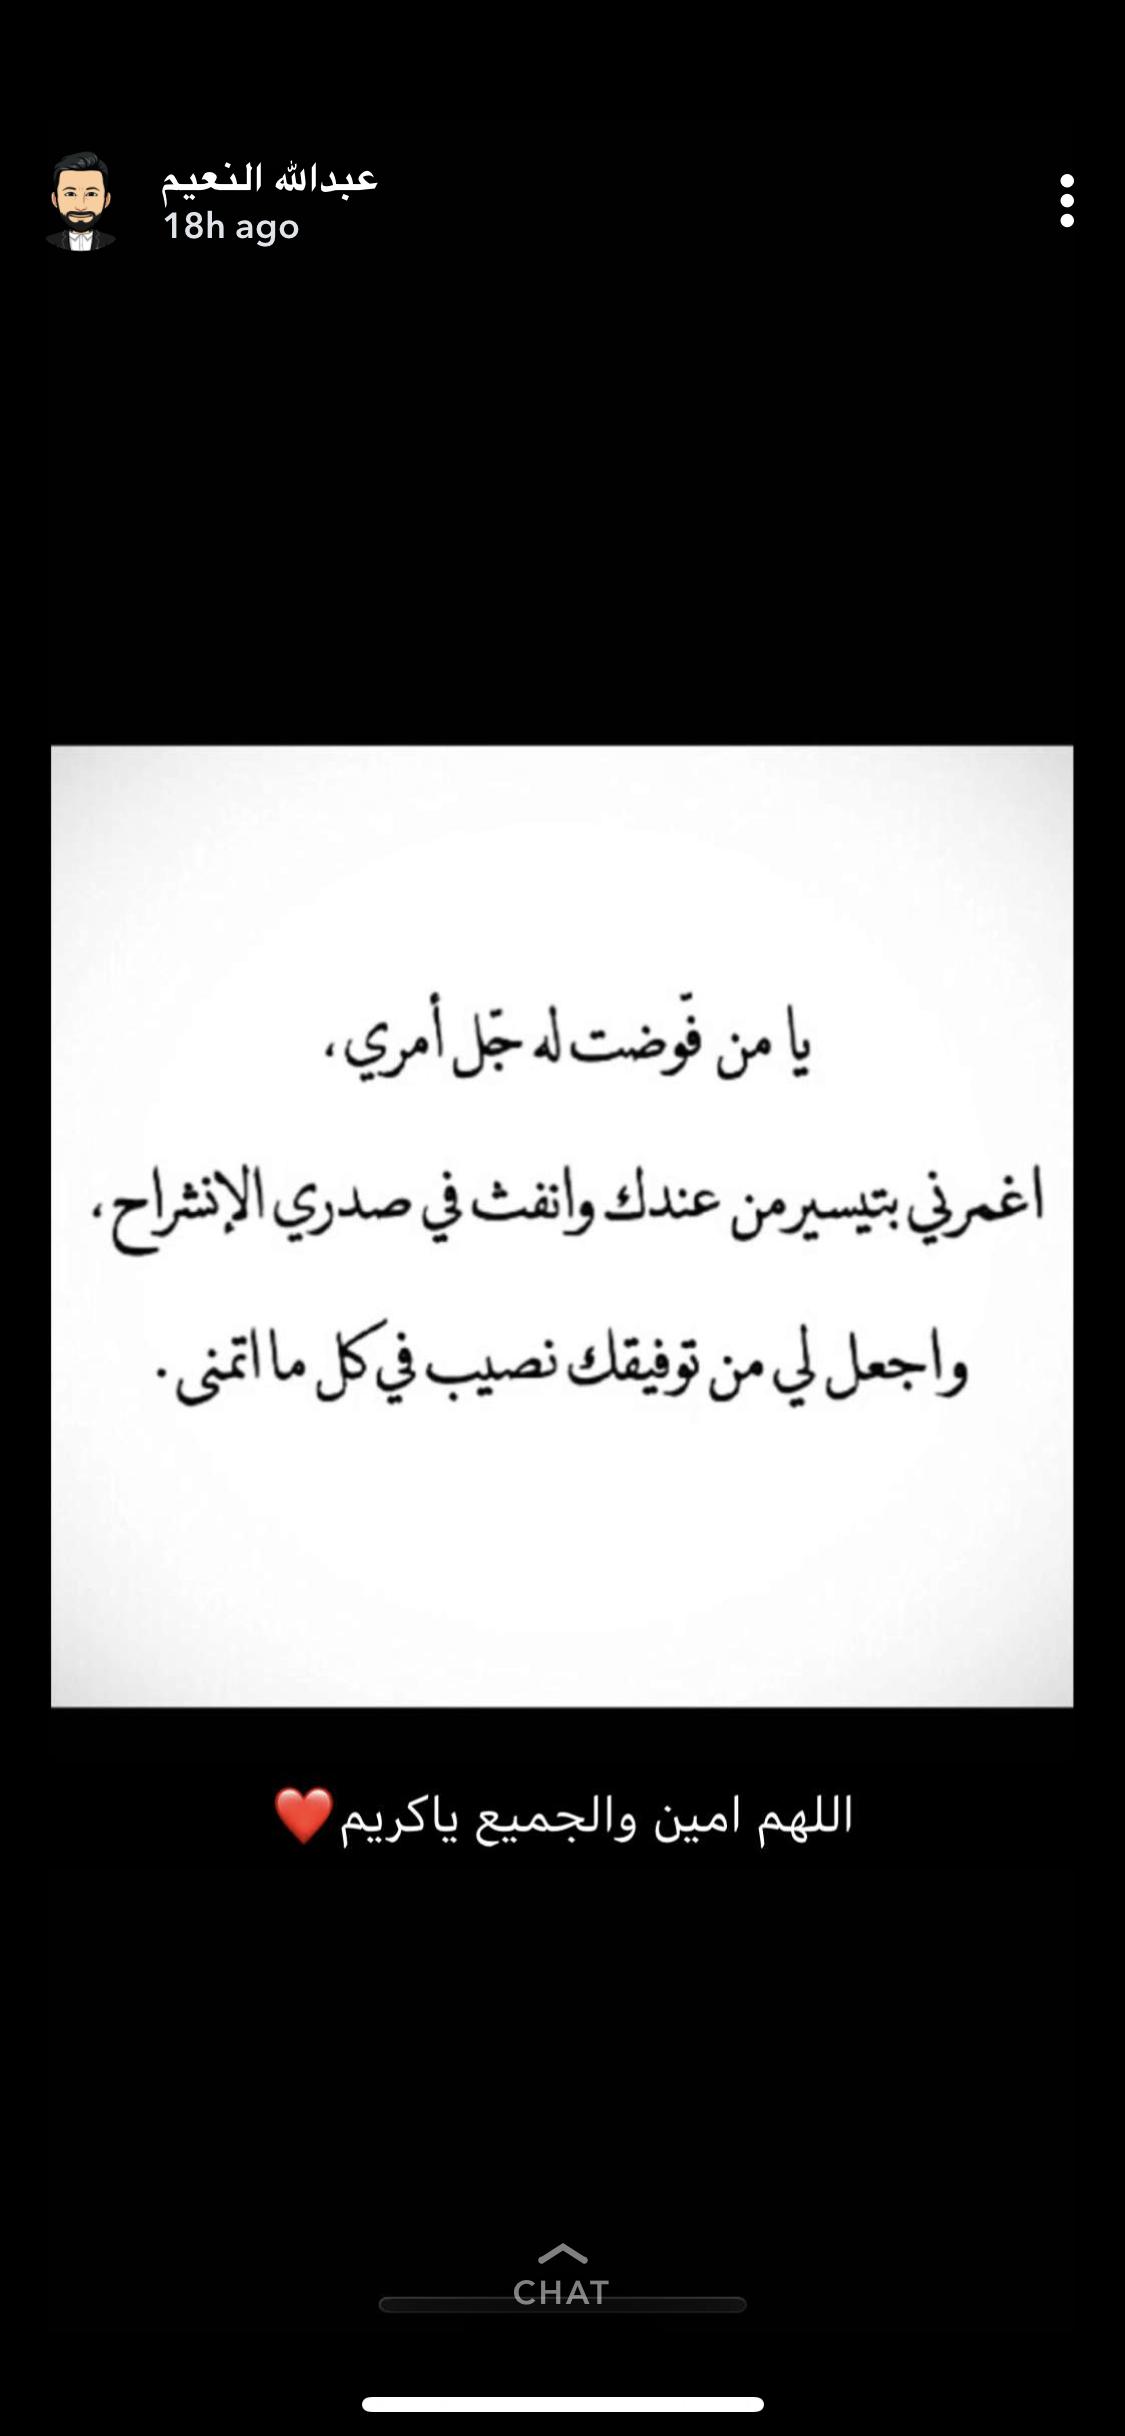 Pin By Ran Saleh On أدعية جميلة Calligraphy Arabic Calligraphy